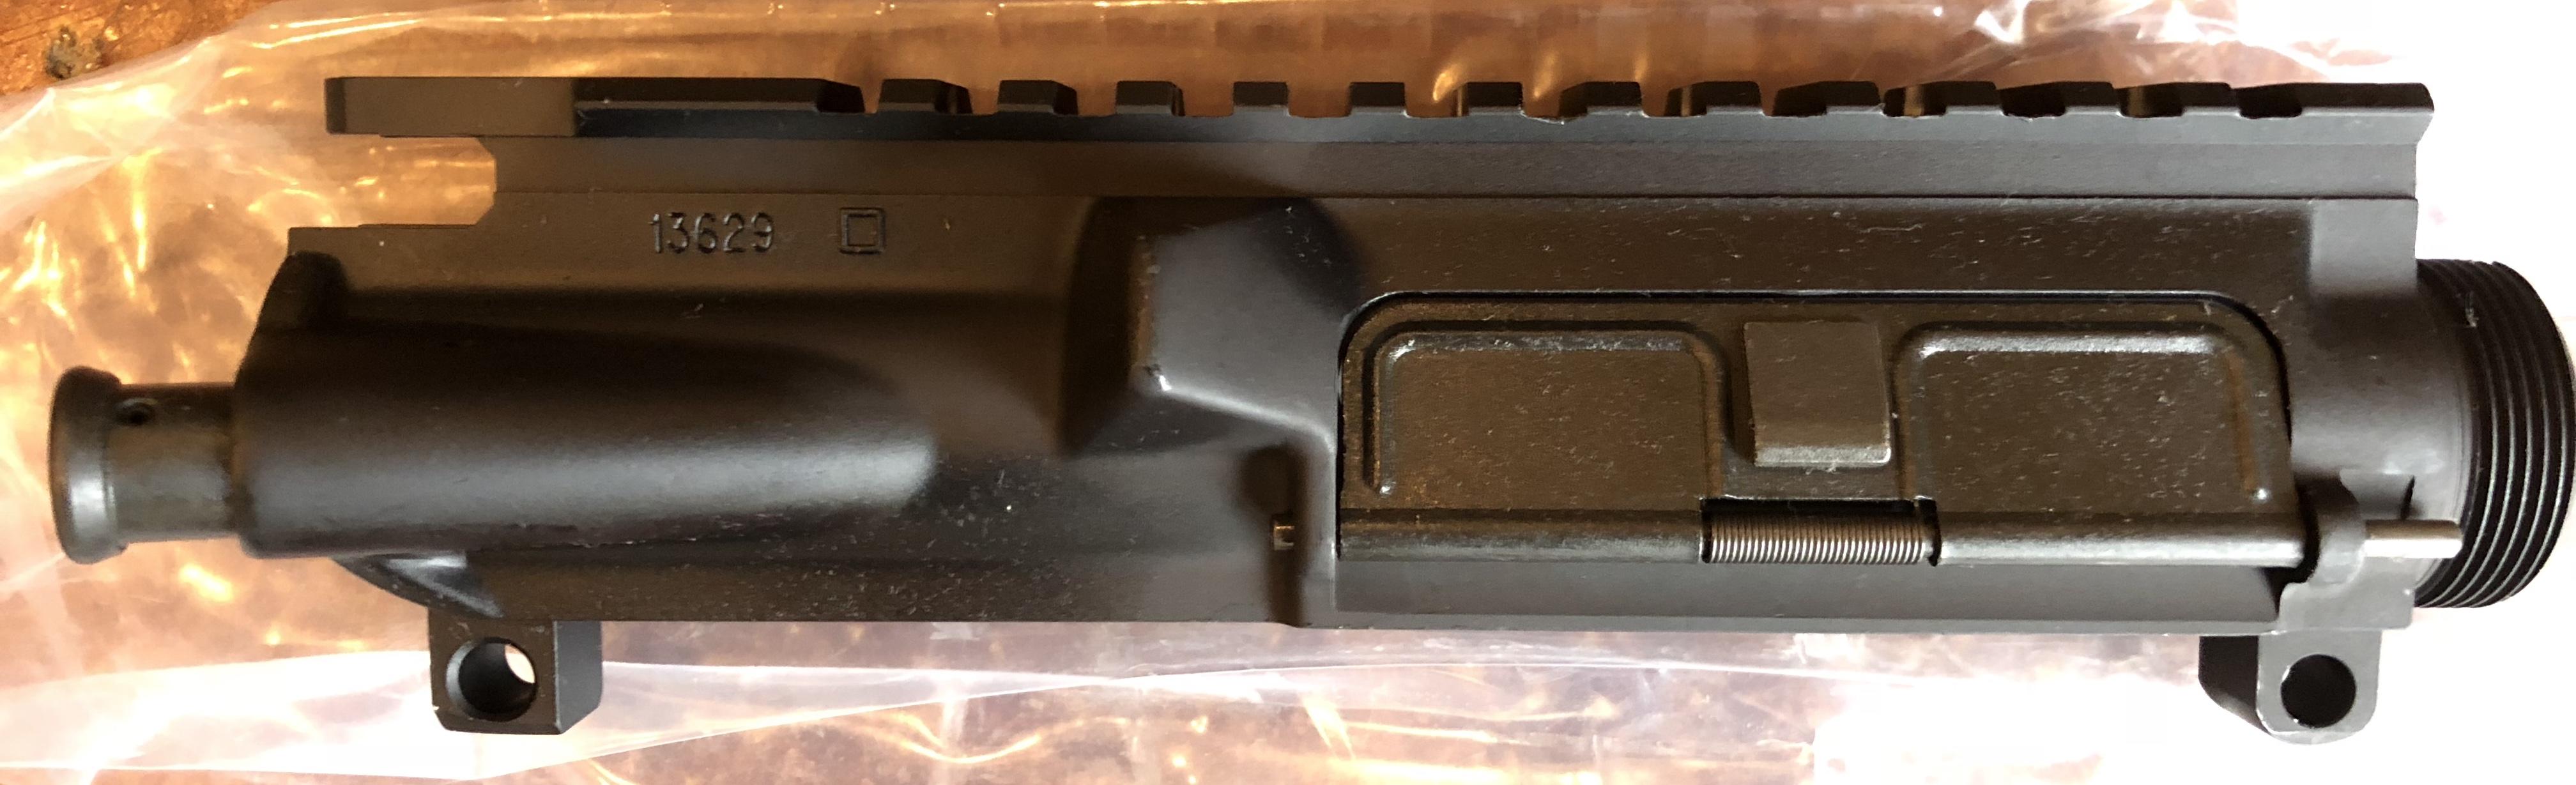 Colt M4 Upper Receiver Assembly